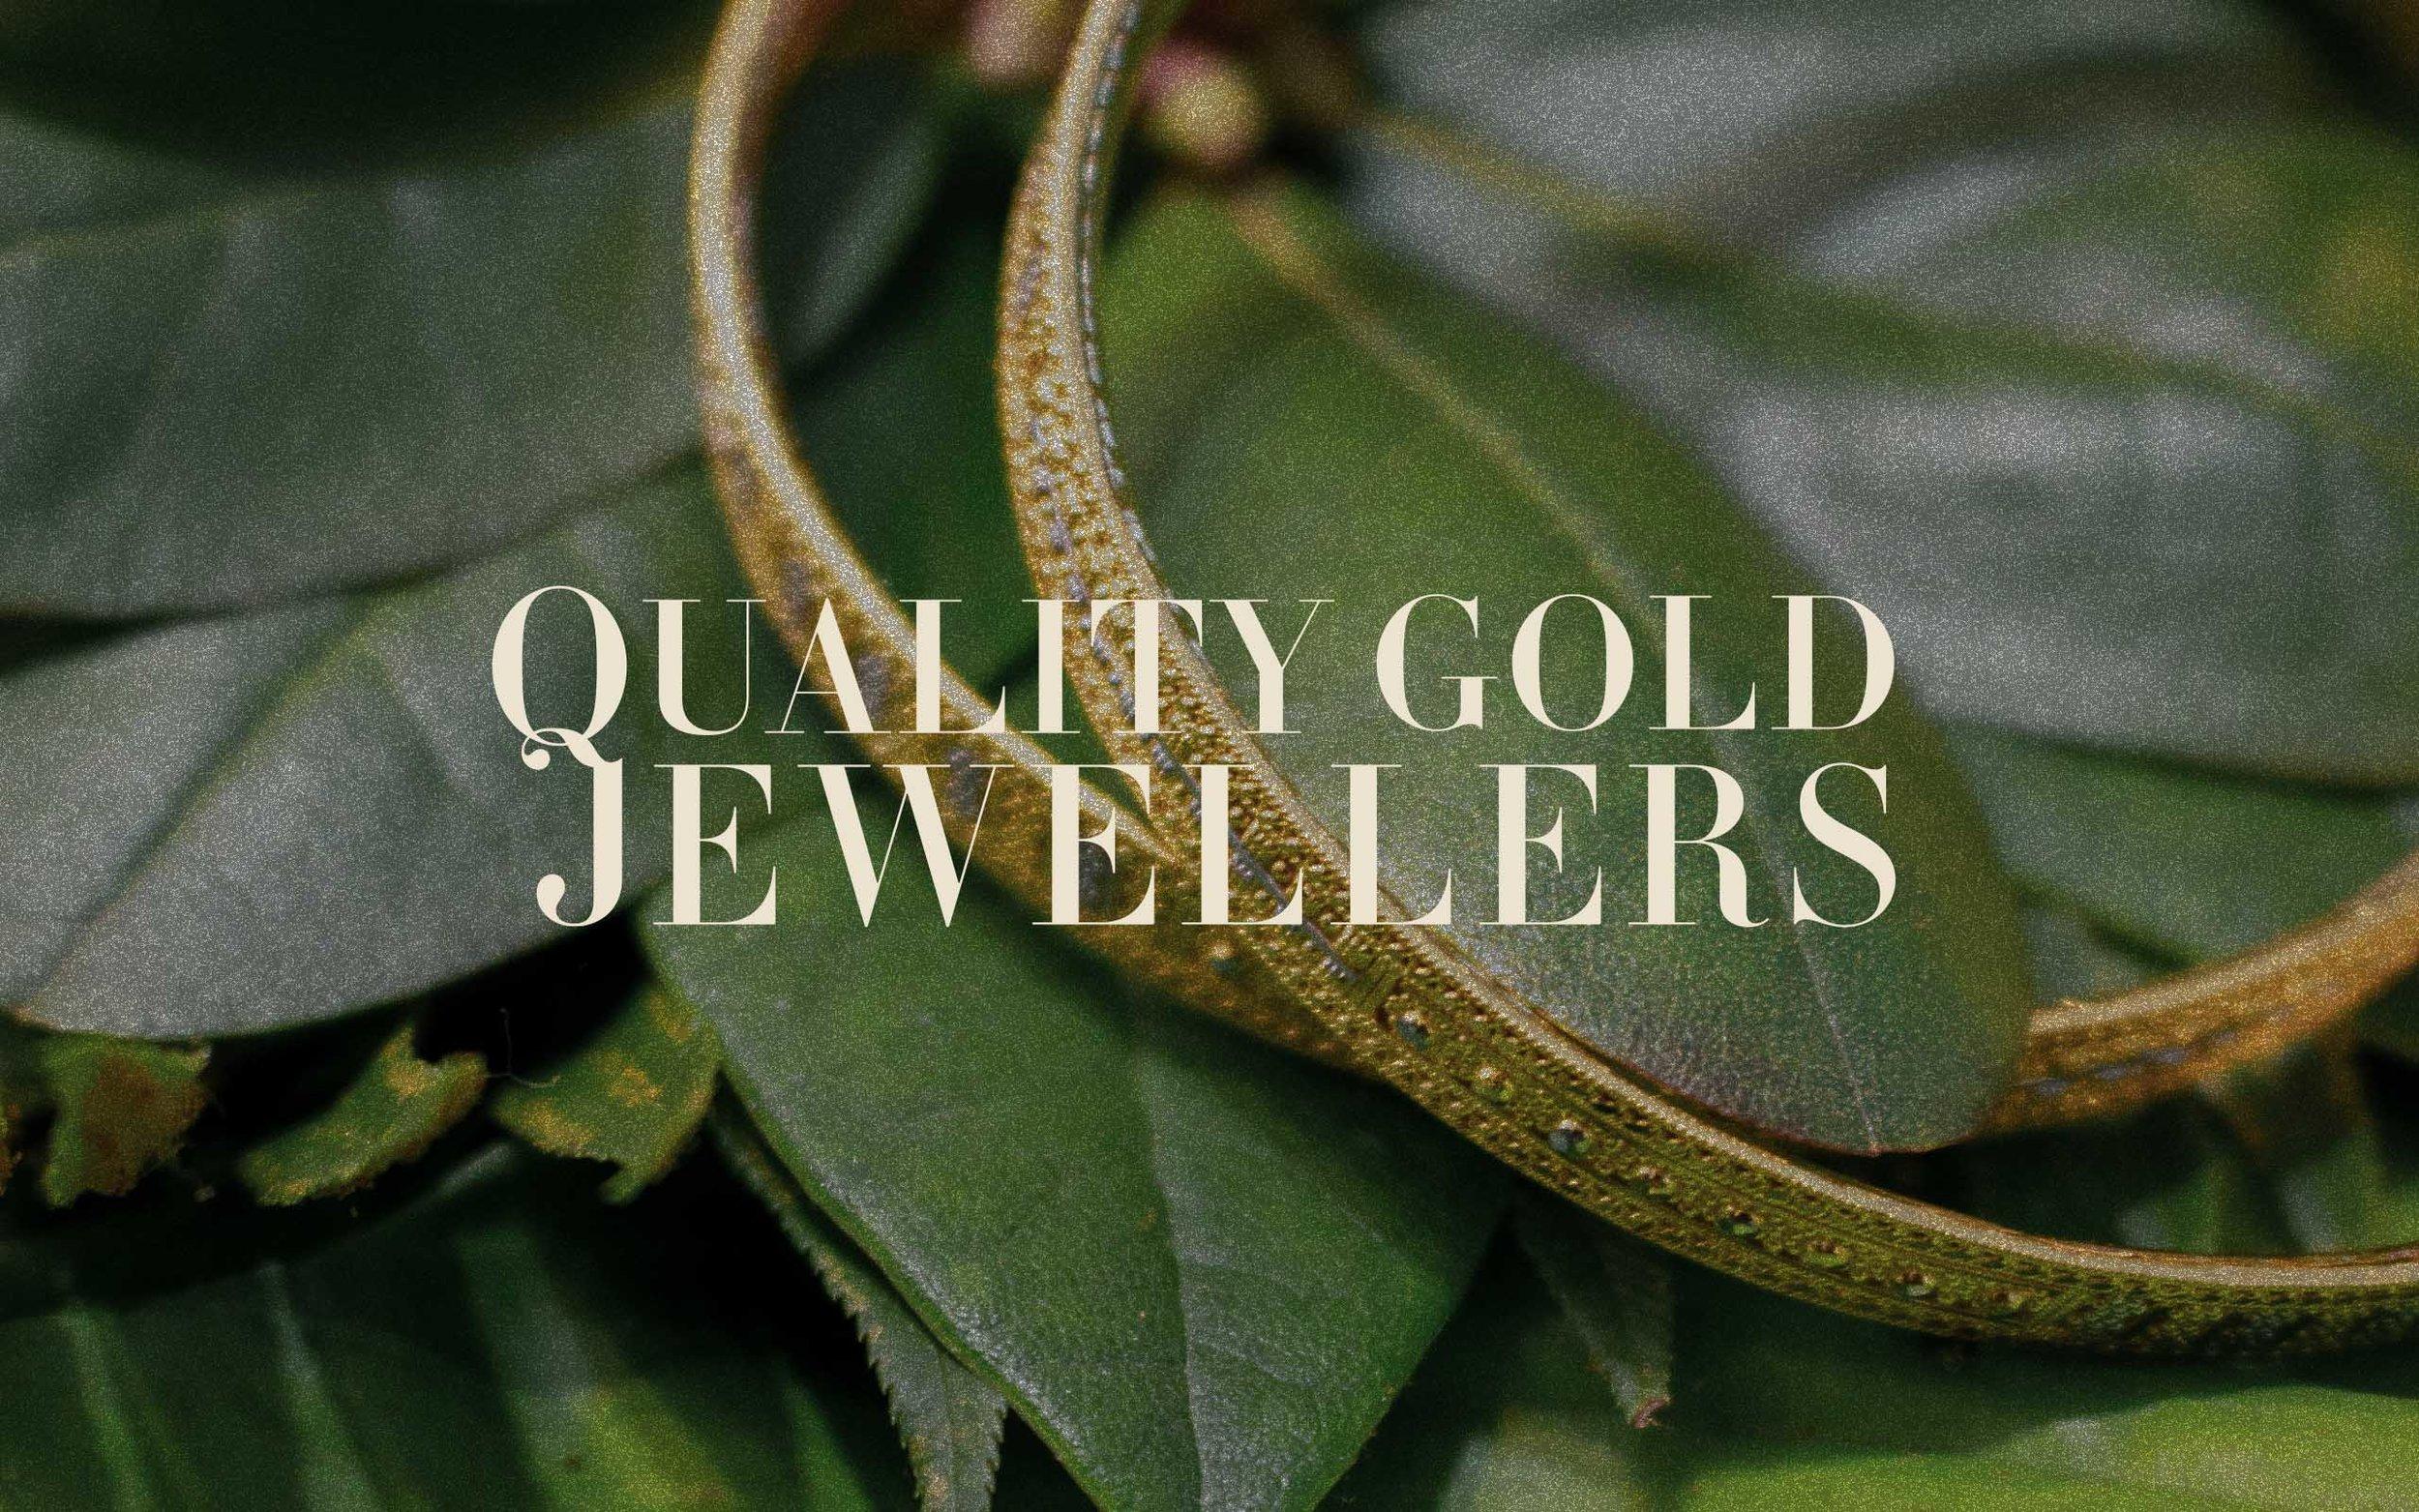 quality-gold-jewellers-logo-main.jpg